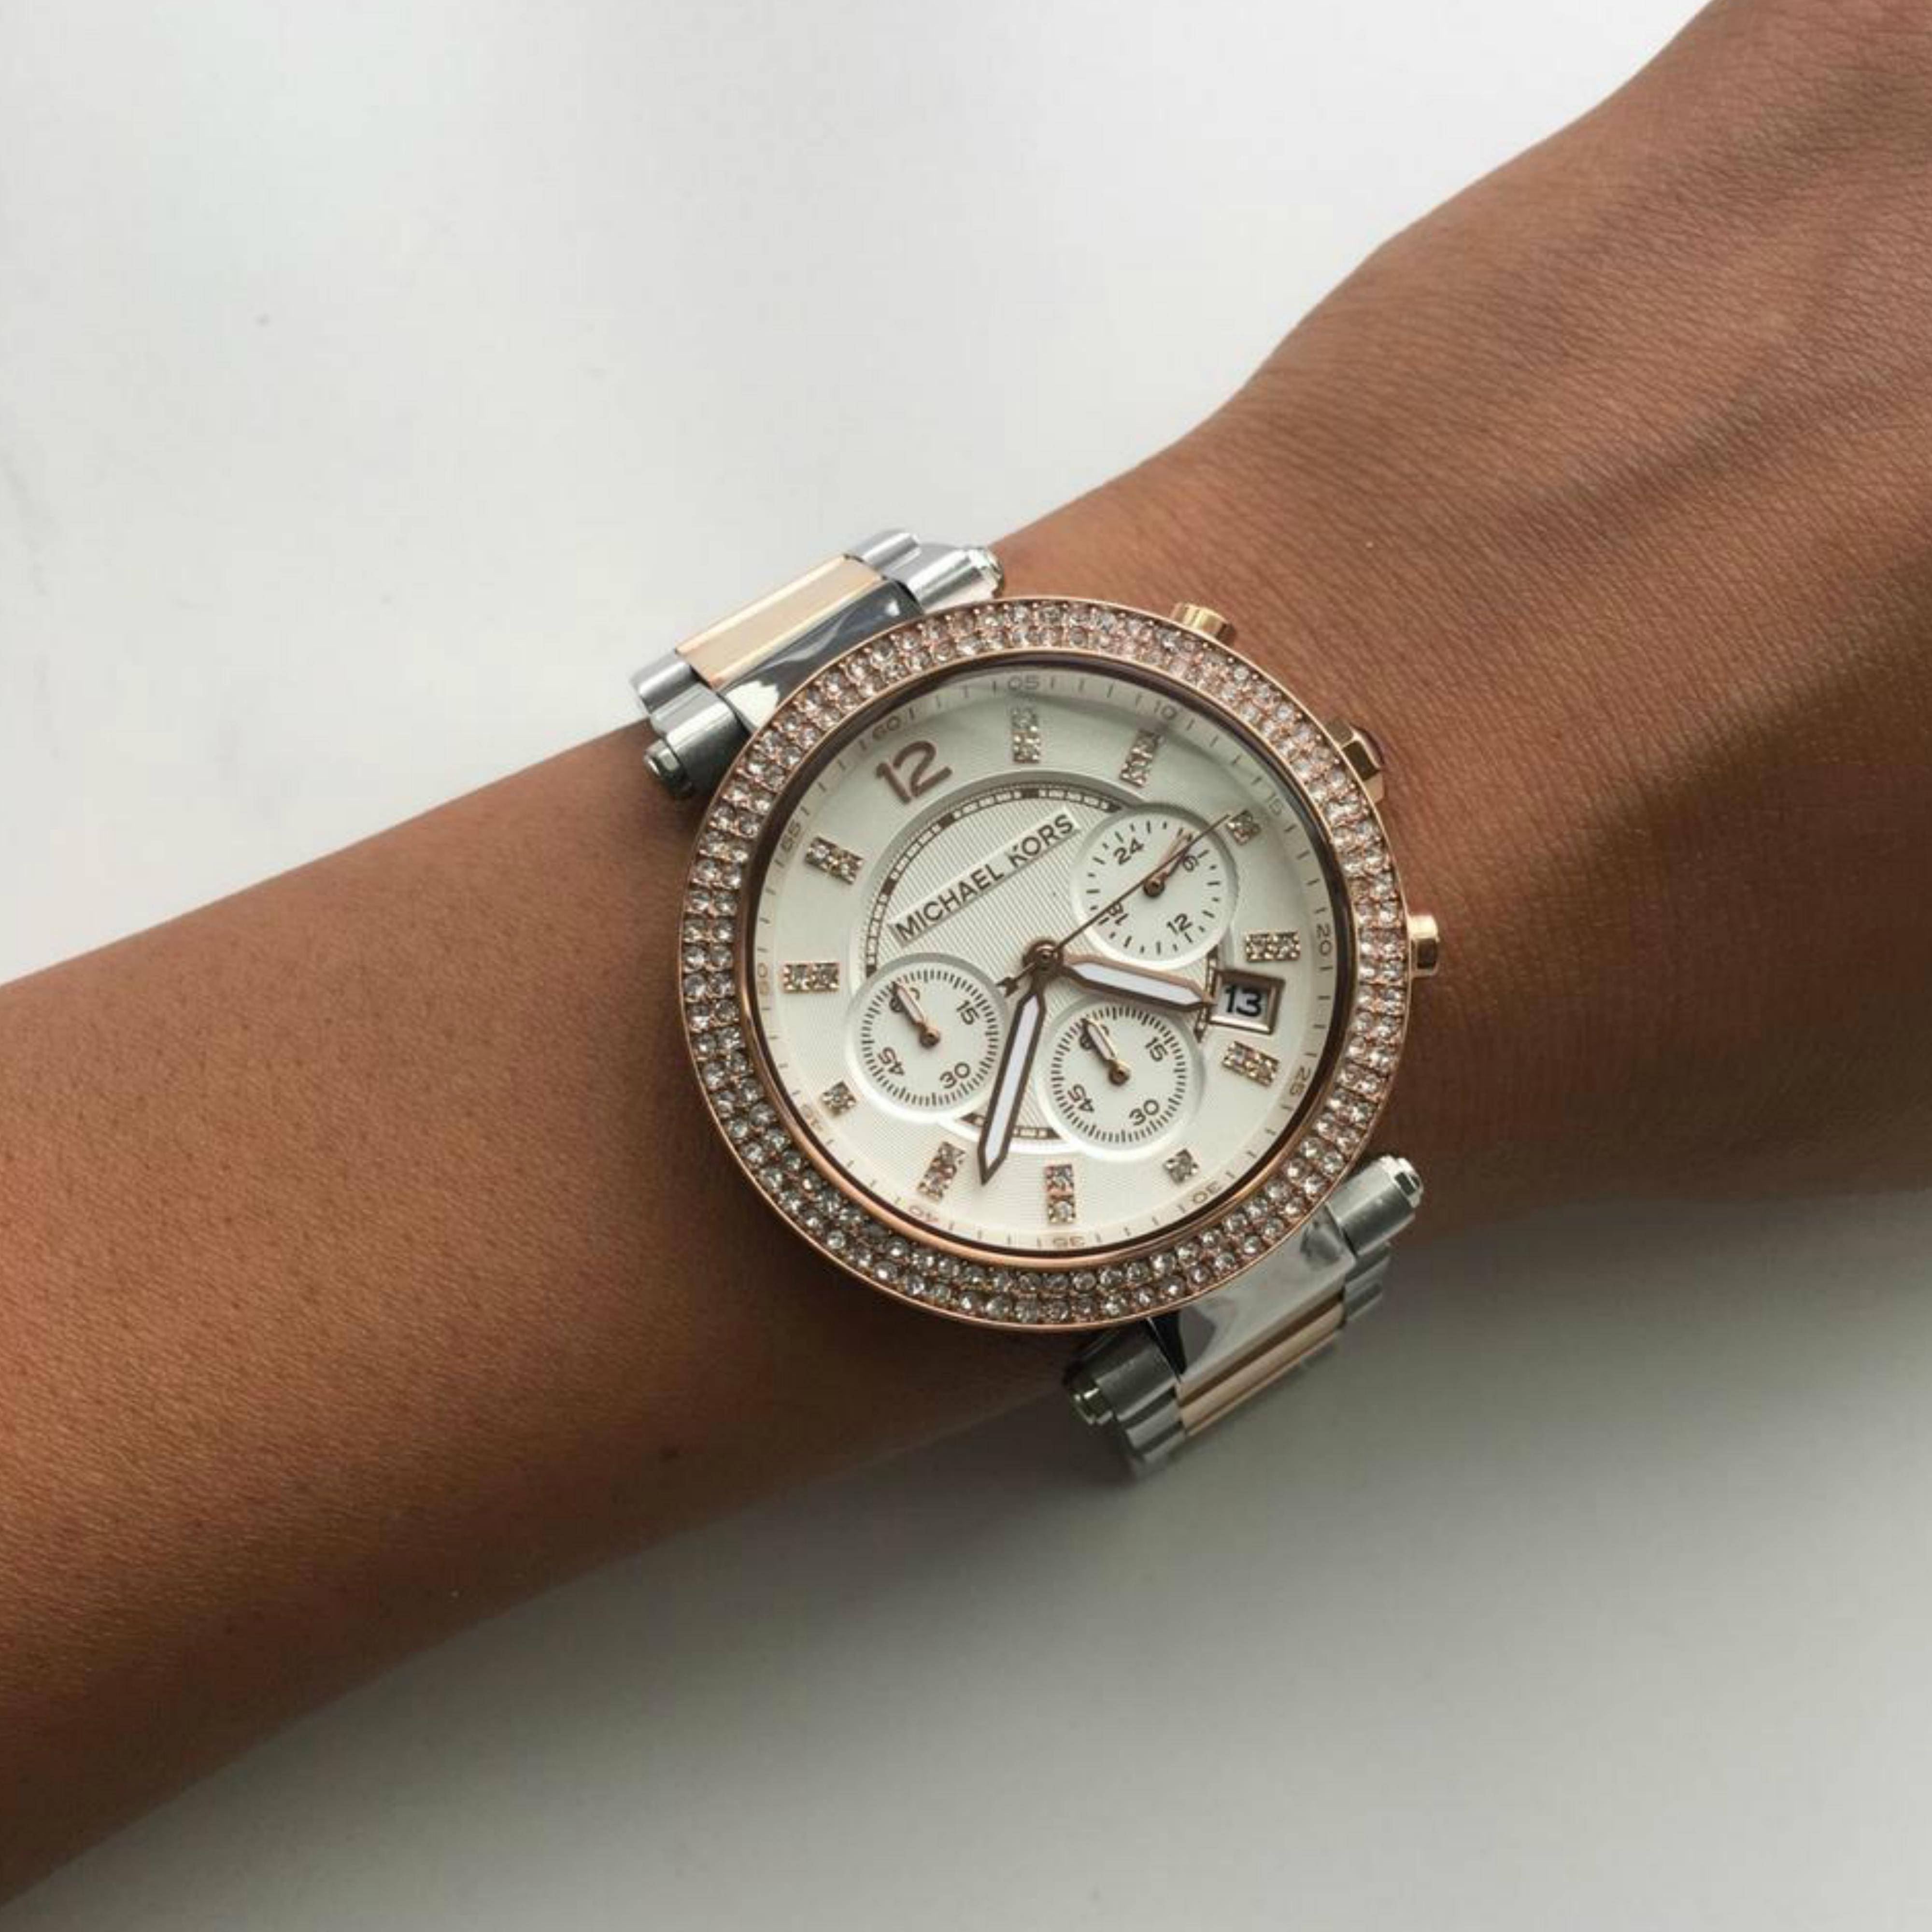 c7ad9fdf7fe4 Michael Kors Ladies Parker Two-Tone Rose Gold Chronograph Daimond Watch  MK5820 Thumbnail 4